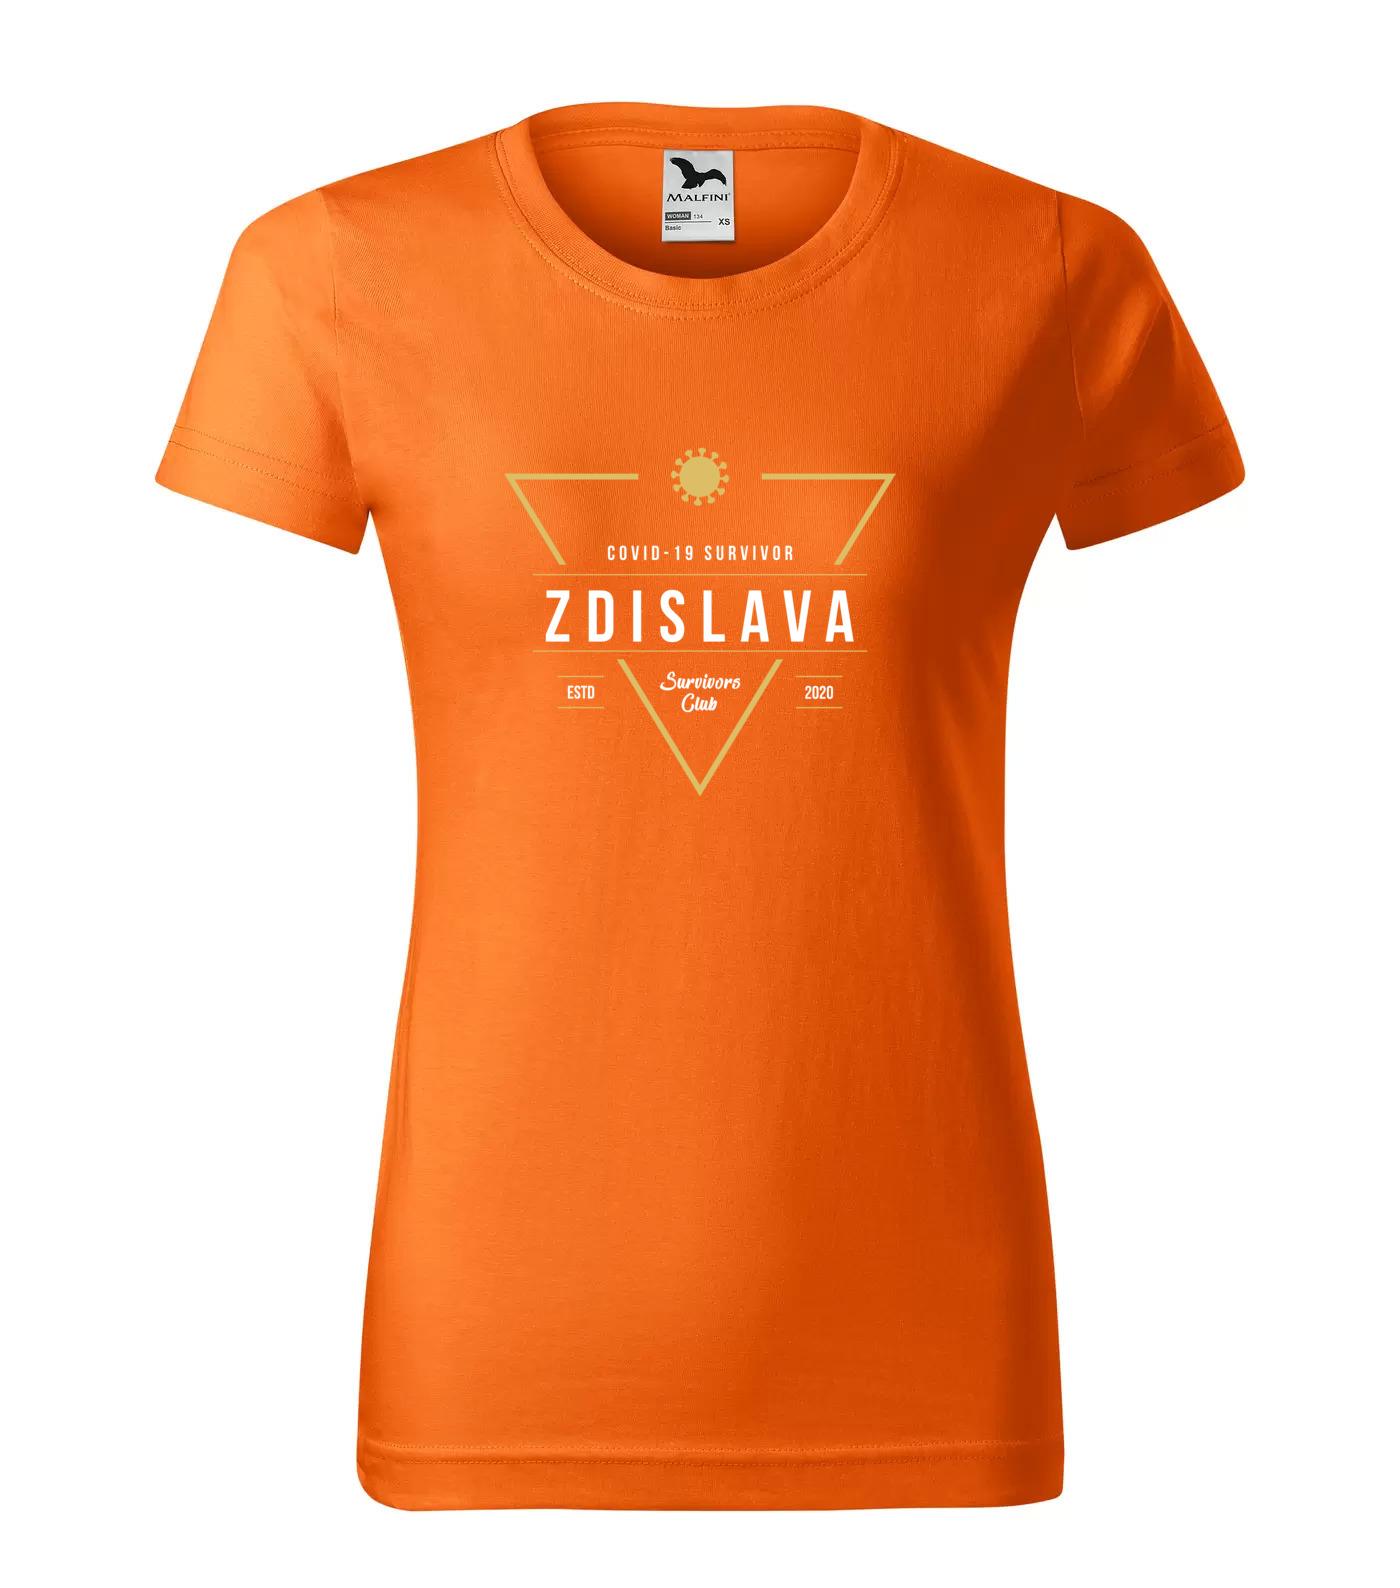 Tričko Survivor Club Zdislava